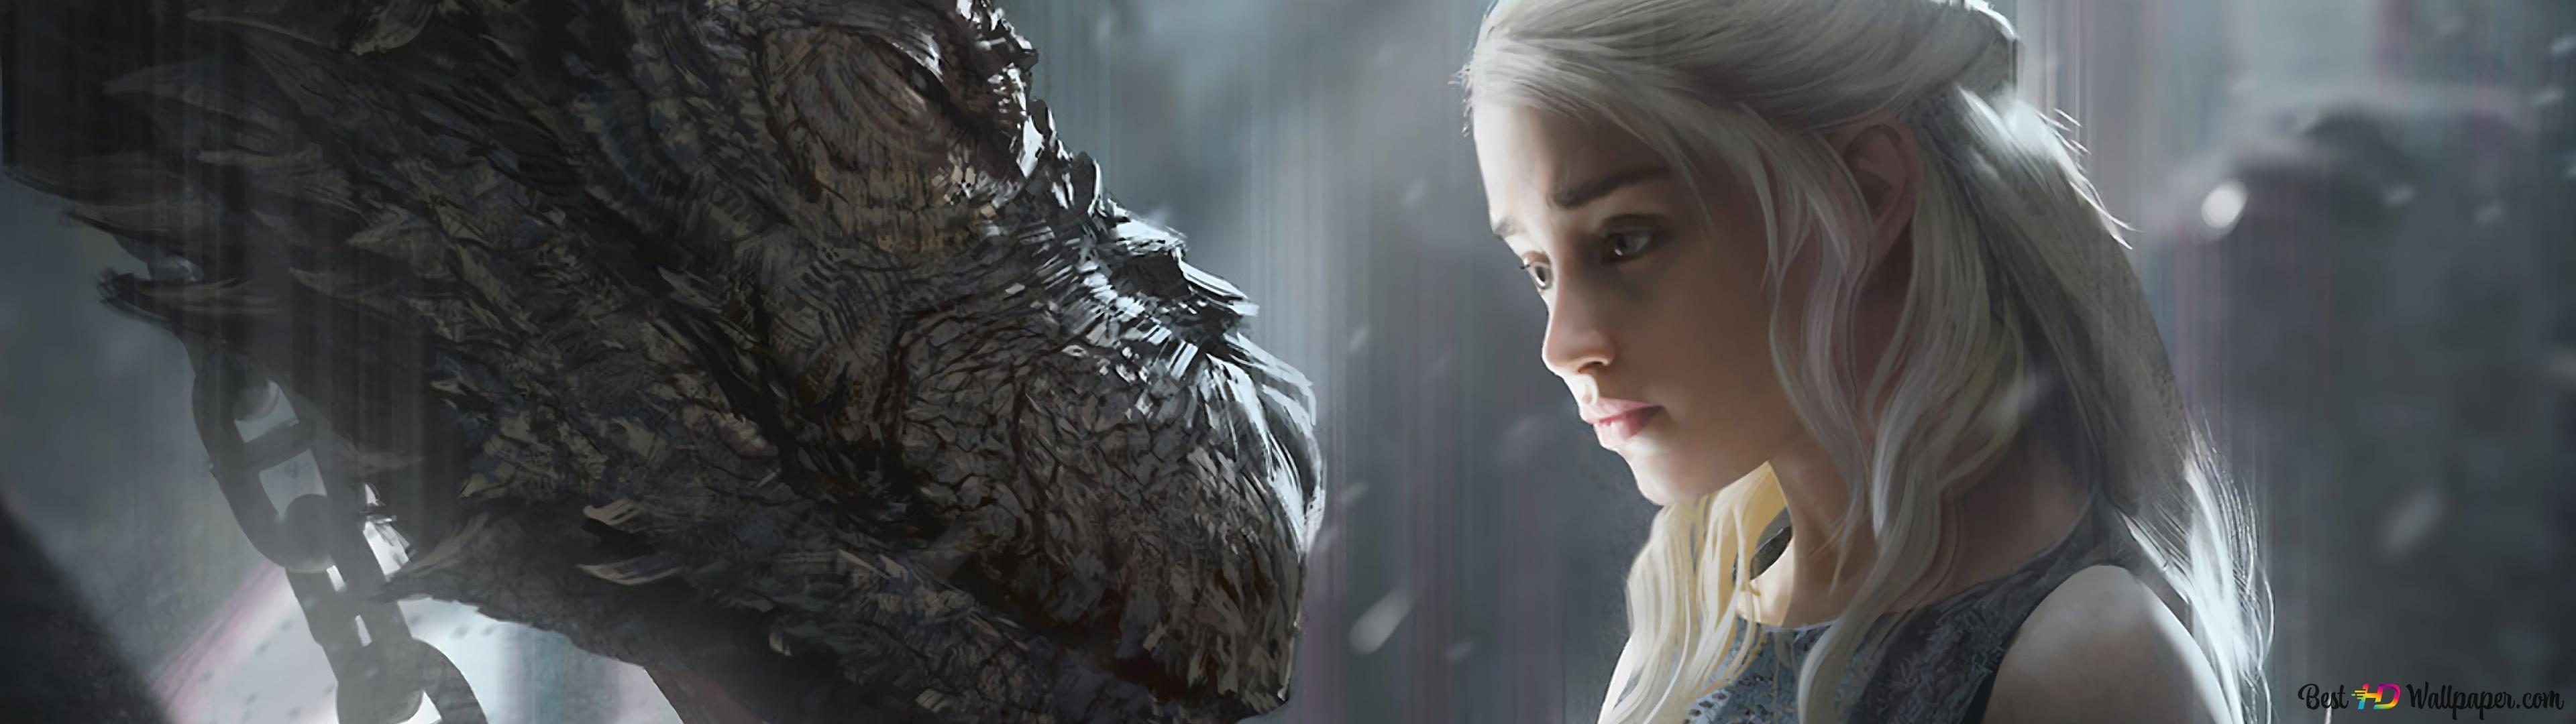 4k Wallpaper Game Of Thrones Dragon Wallpaper Hd